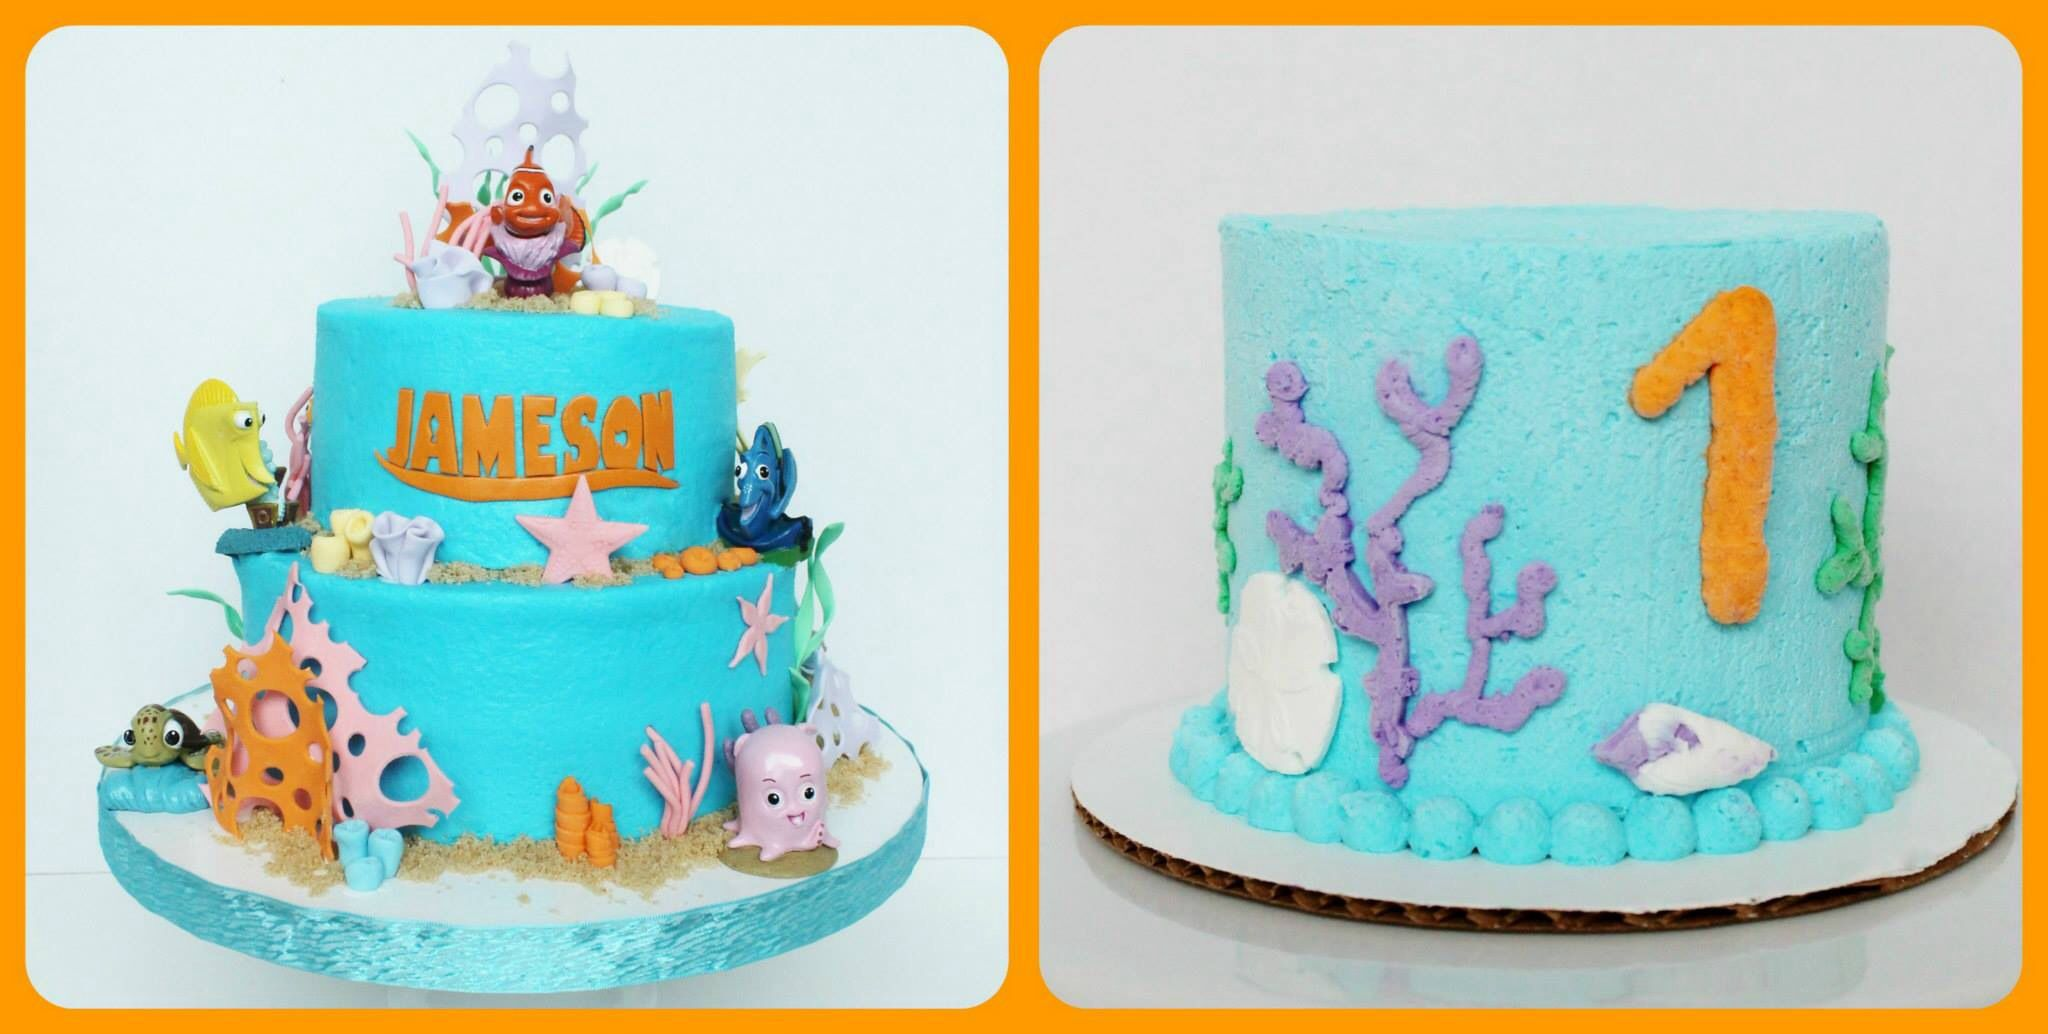 Nemo theme cake and sugarfree smash cake with whipped cream